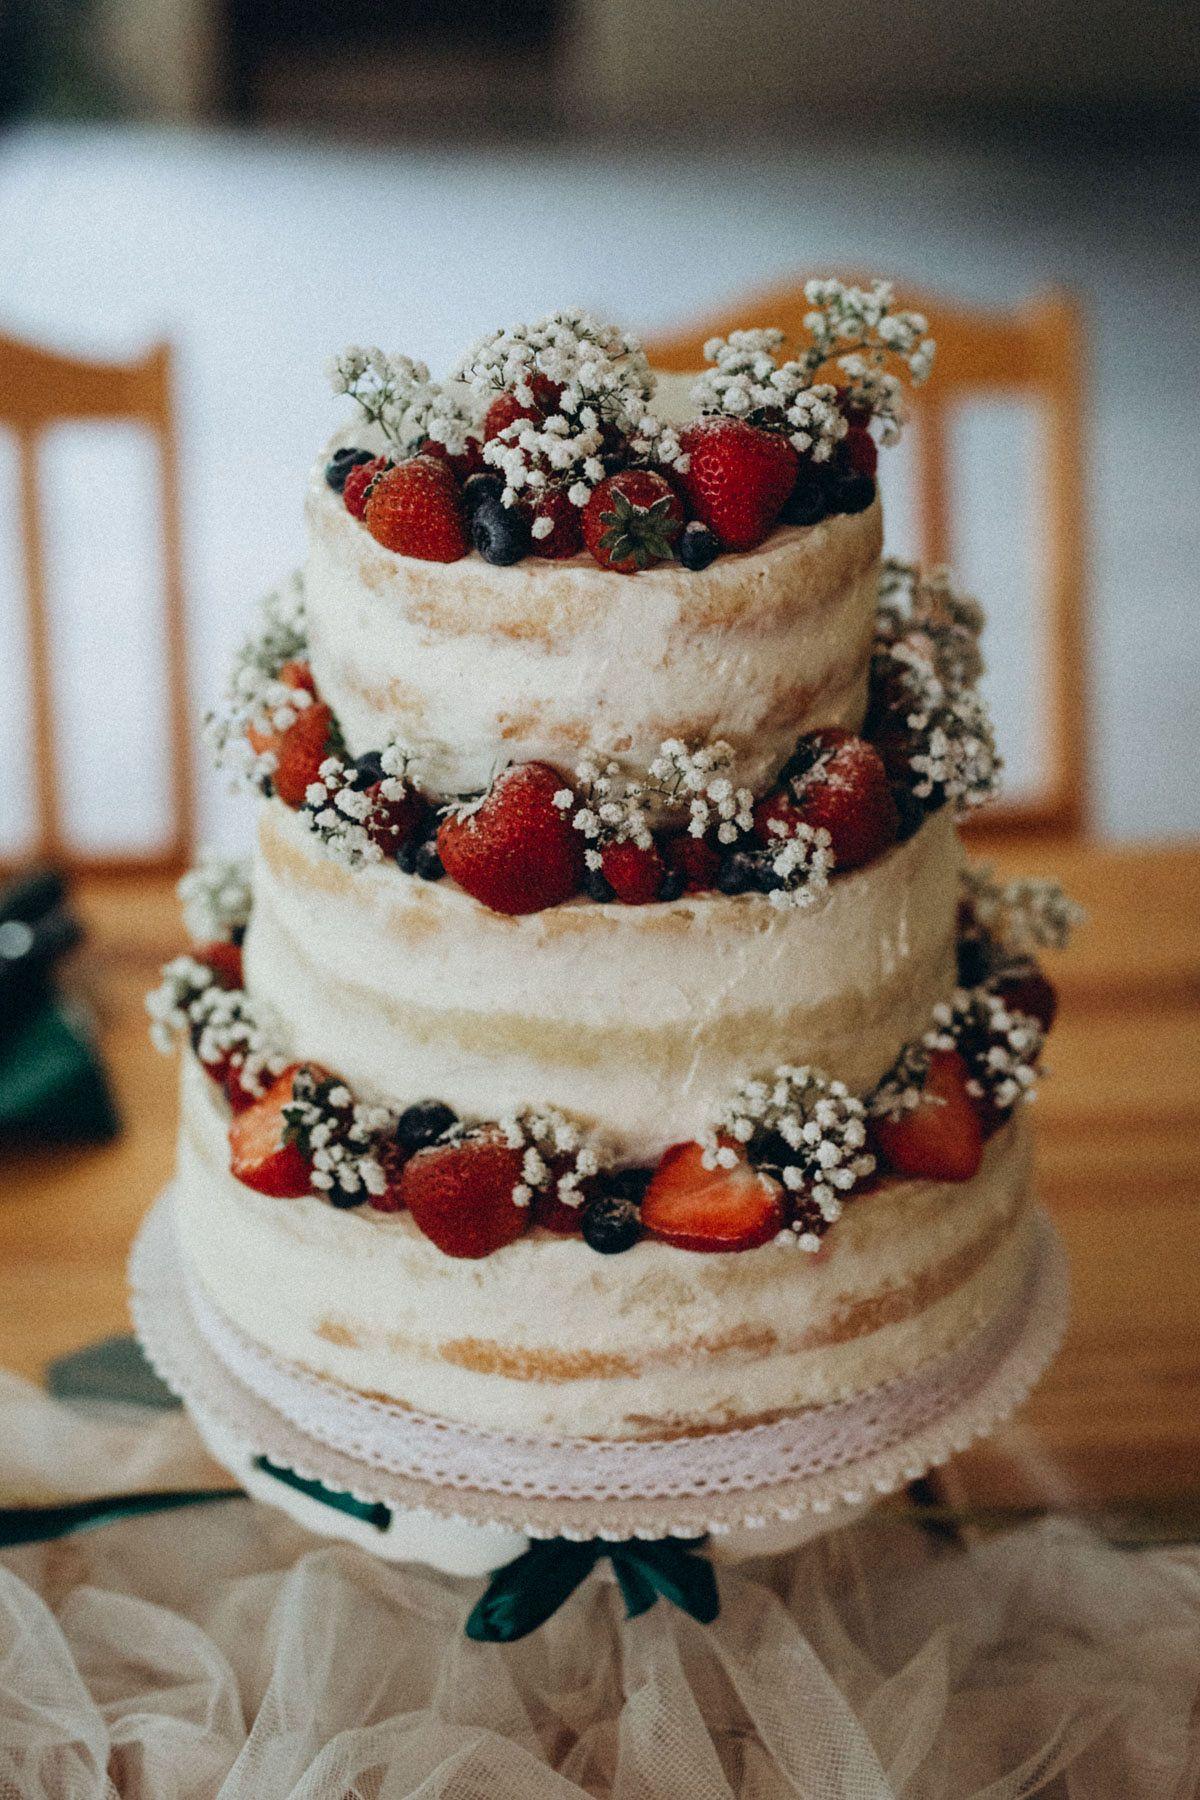 Naše svatba | Simple wedding cake, Traditional wedding cakes, Bridal shower  desserts